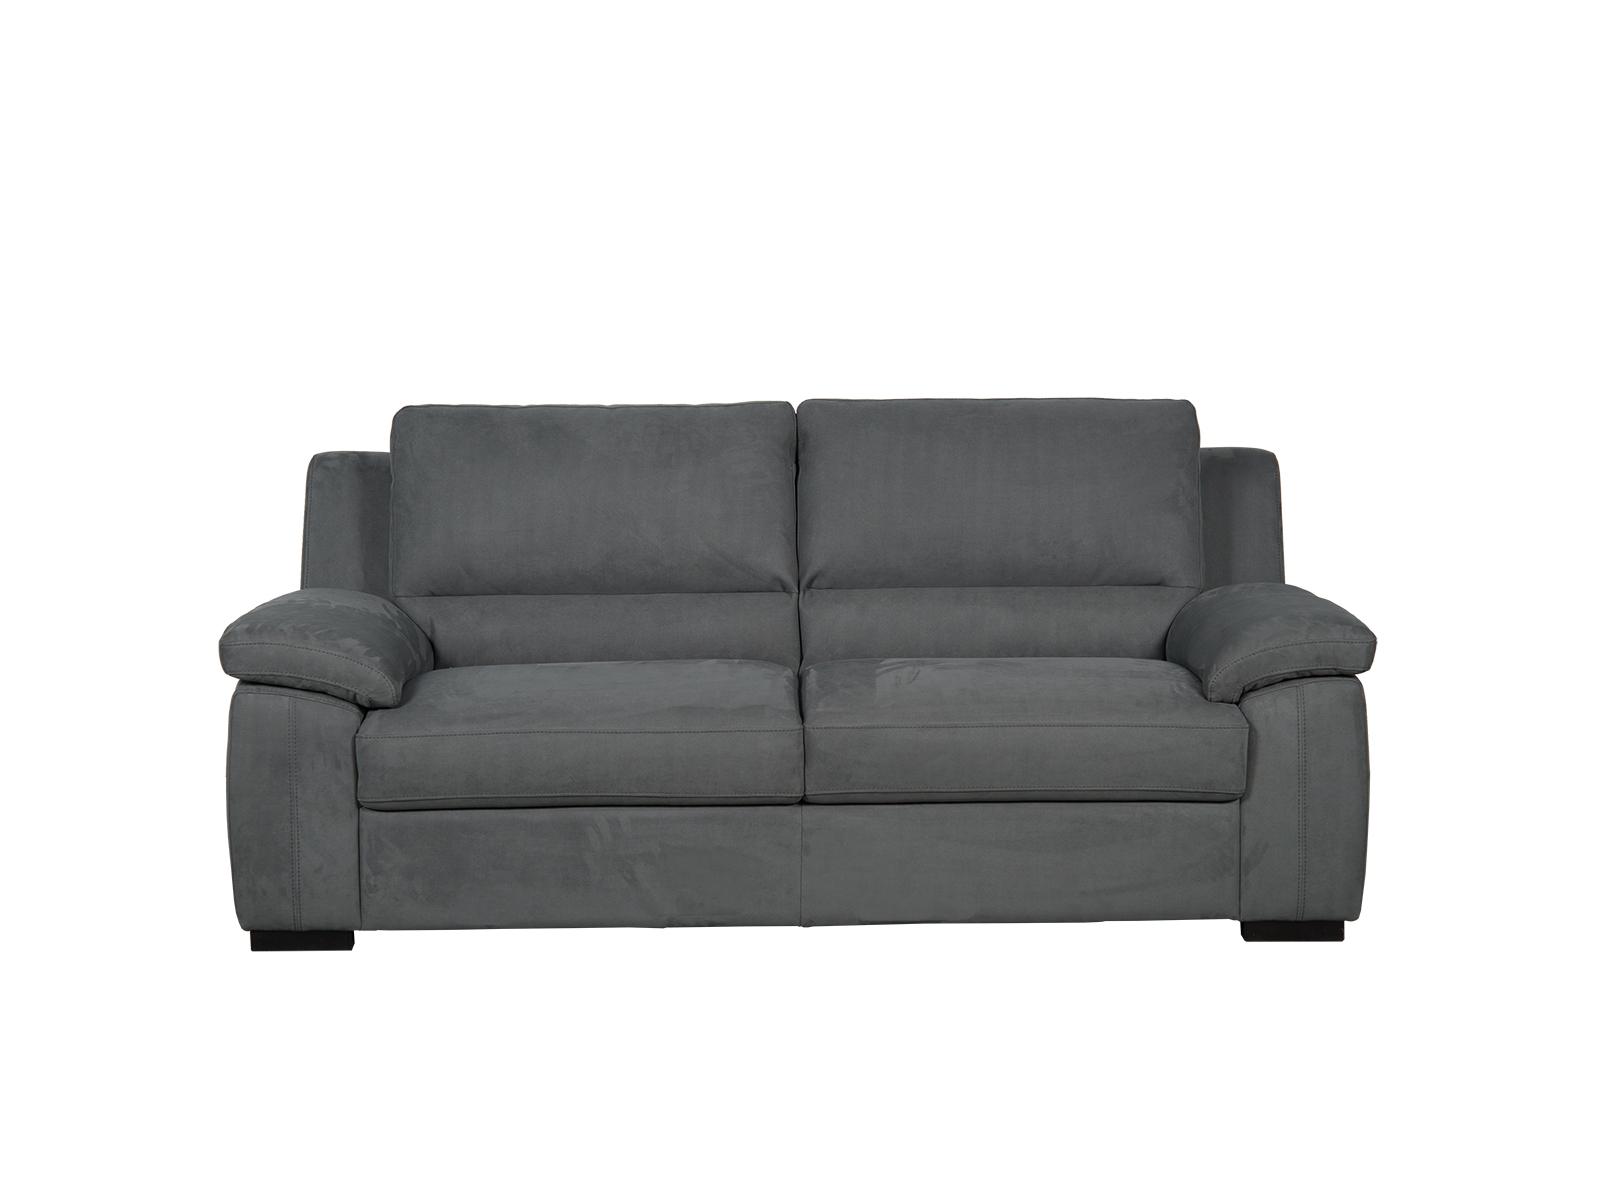 Canapea fixa 3 locuri Rubis Grey